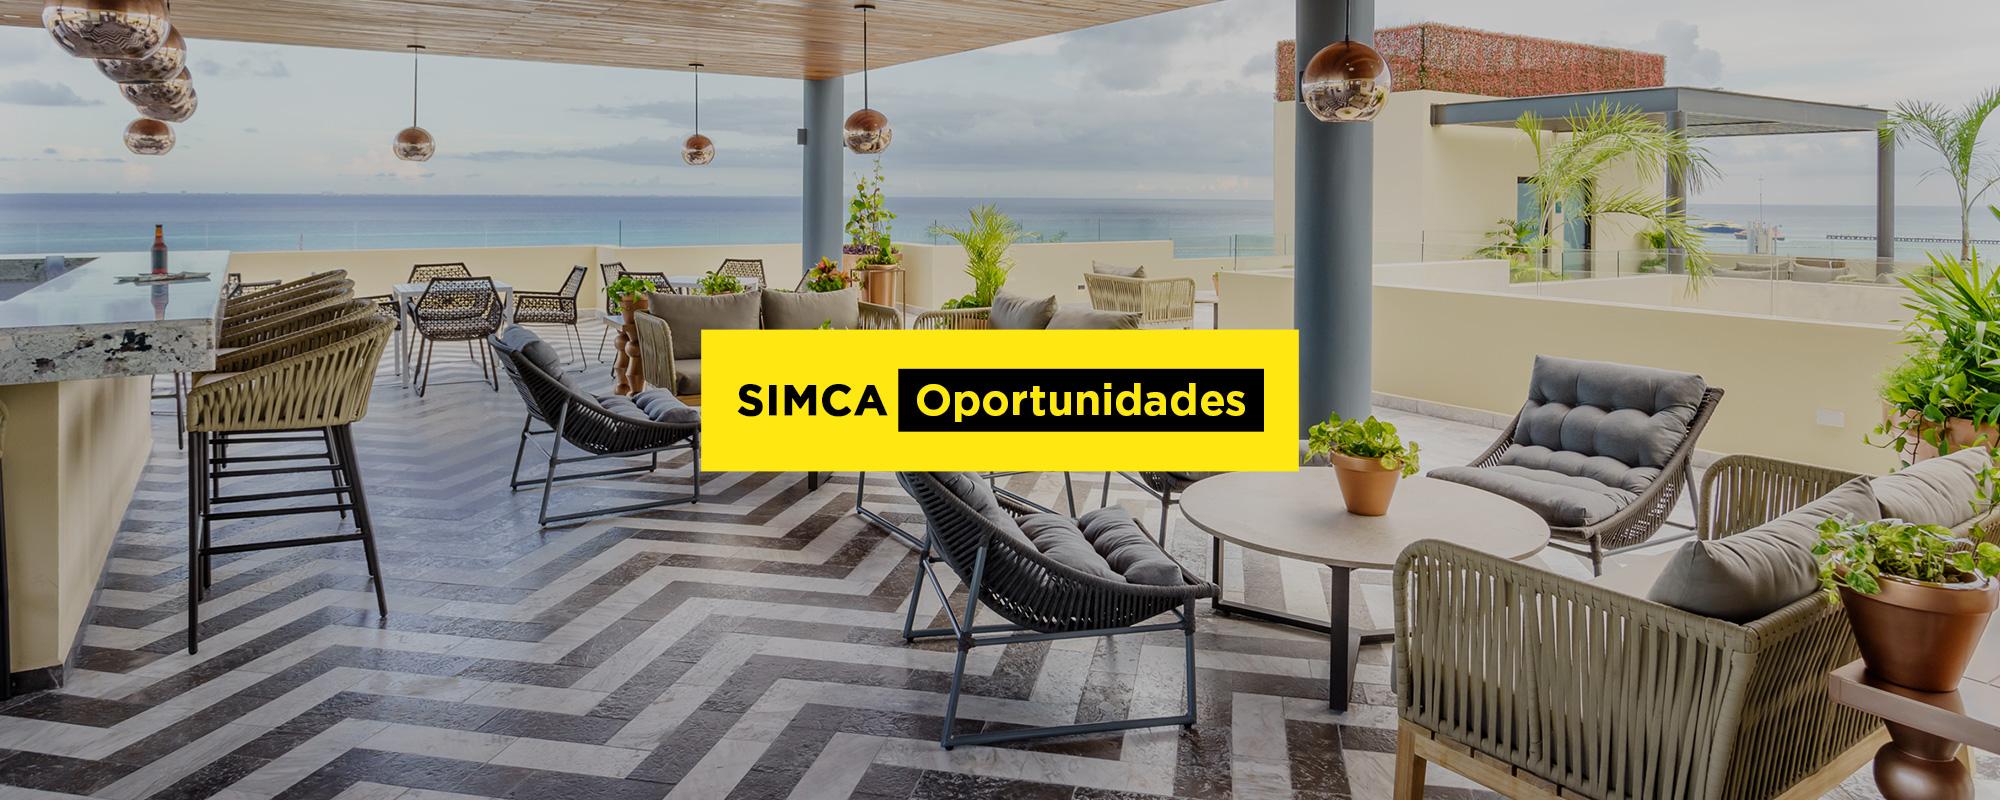 simca-oportunidades-2-slider-singular